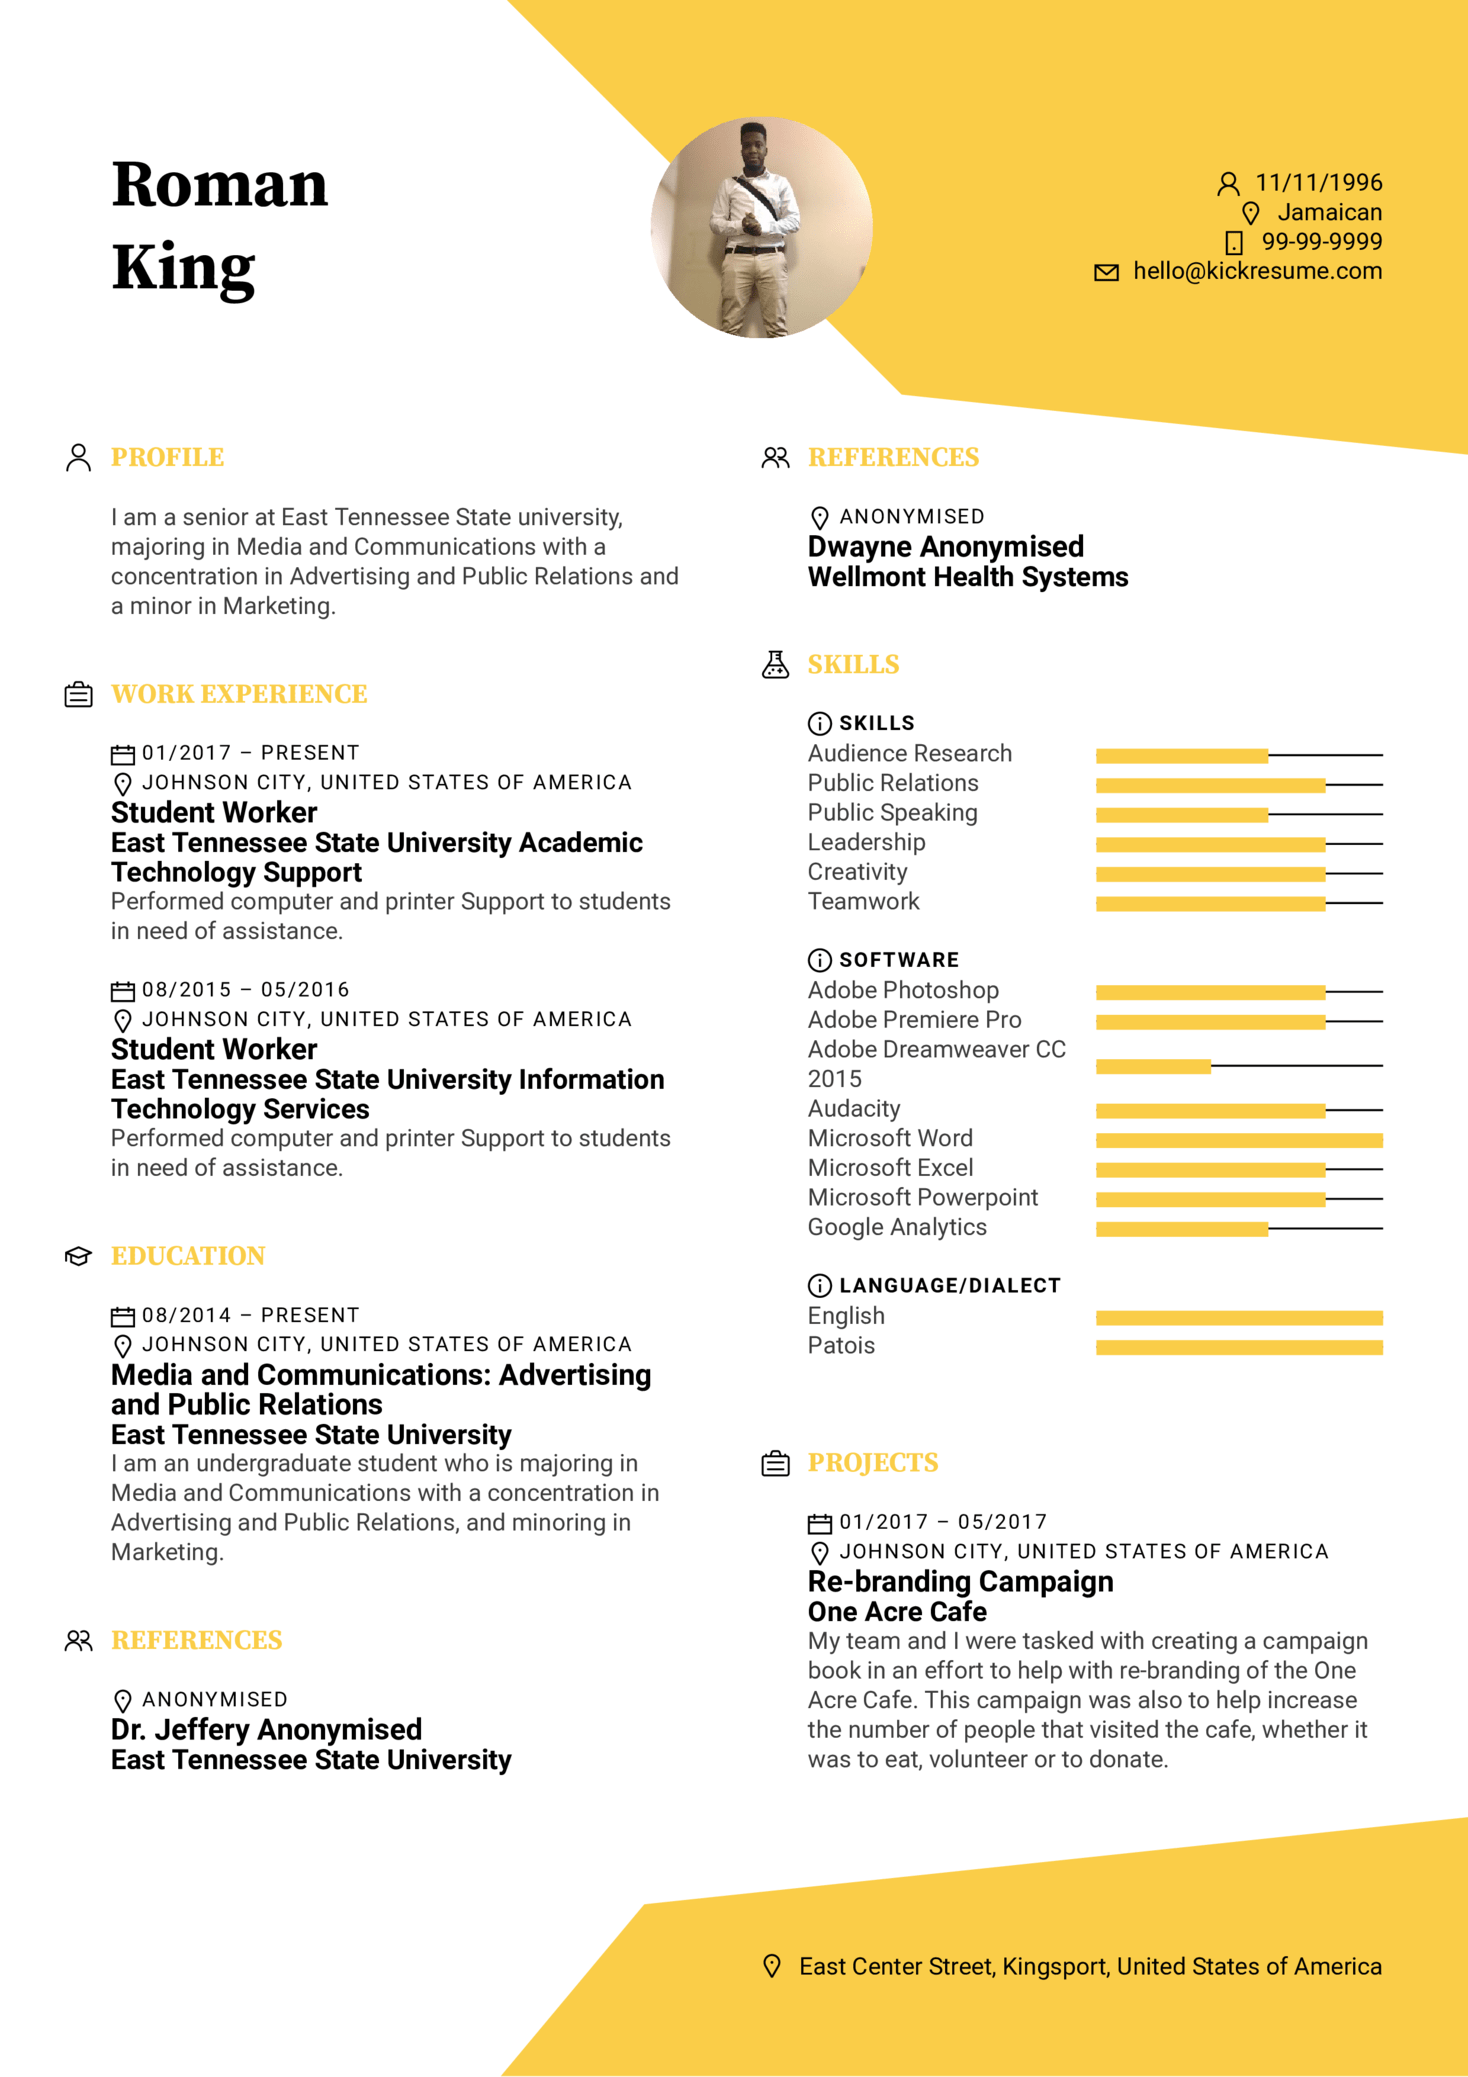 Media Specialist Intern Resume Template (Part 1)